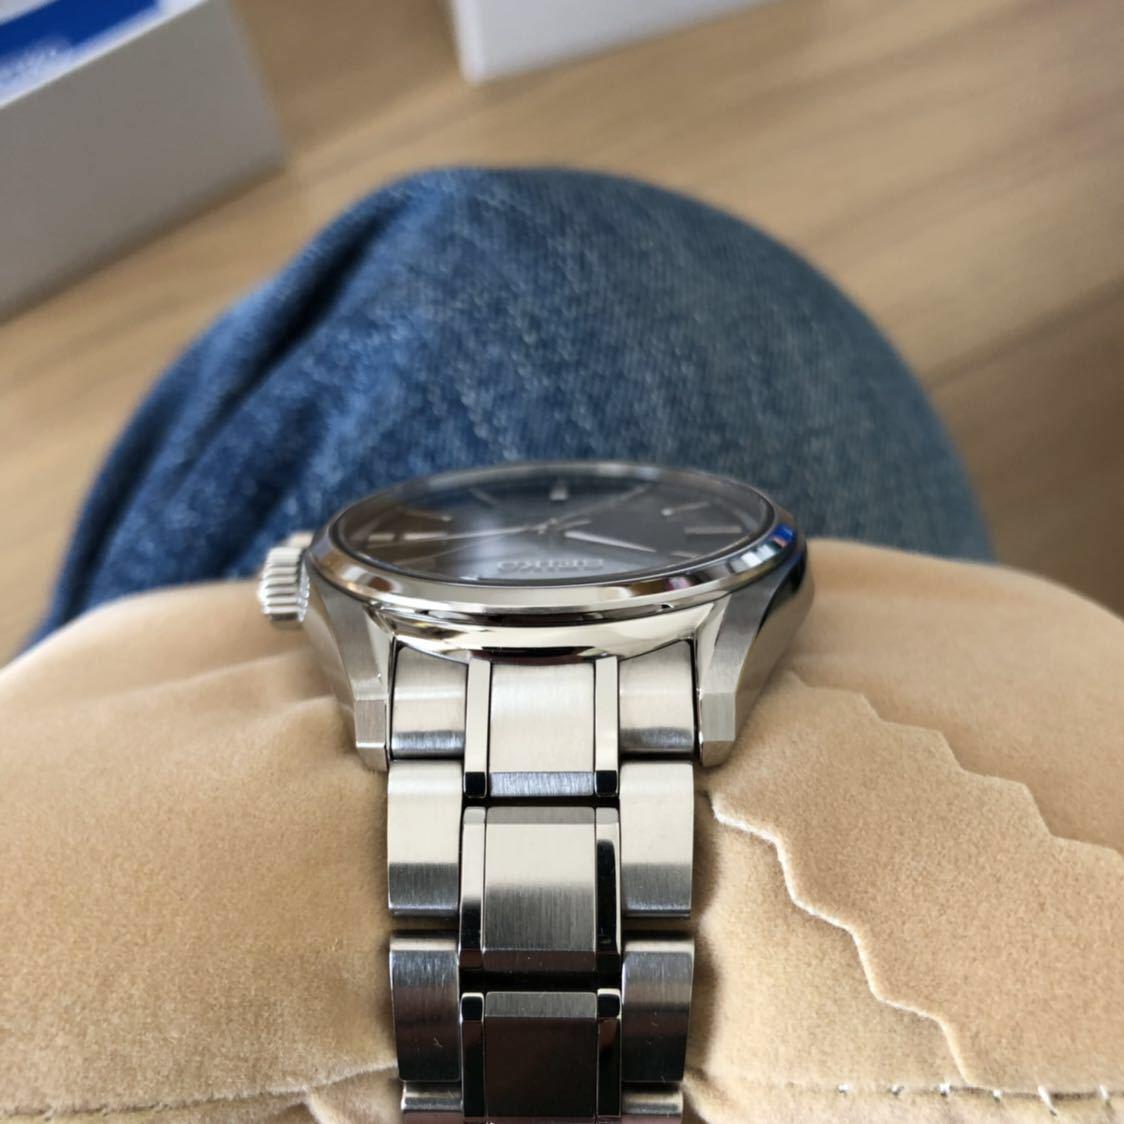 SEIKO PRESAGE SARX035 セイコー プレザージュ 機械式 メカニカル 腕時計 自動巻_画像6